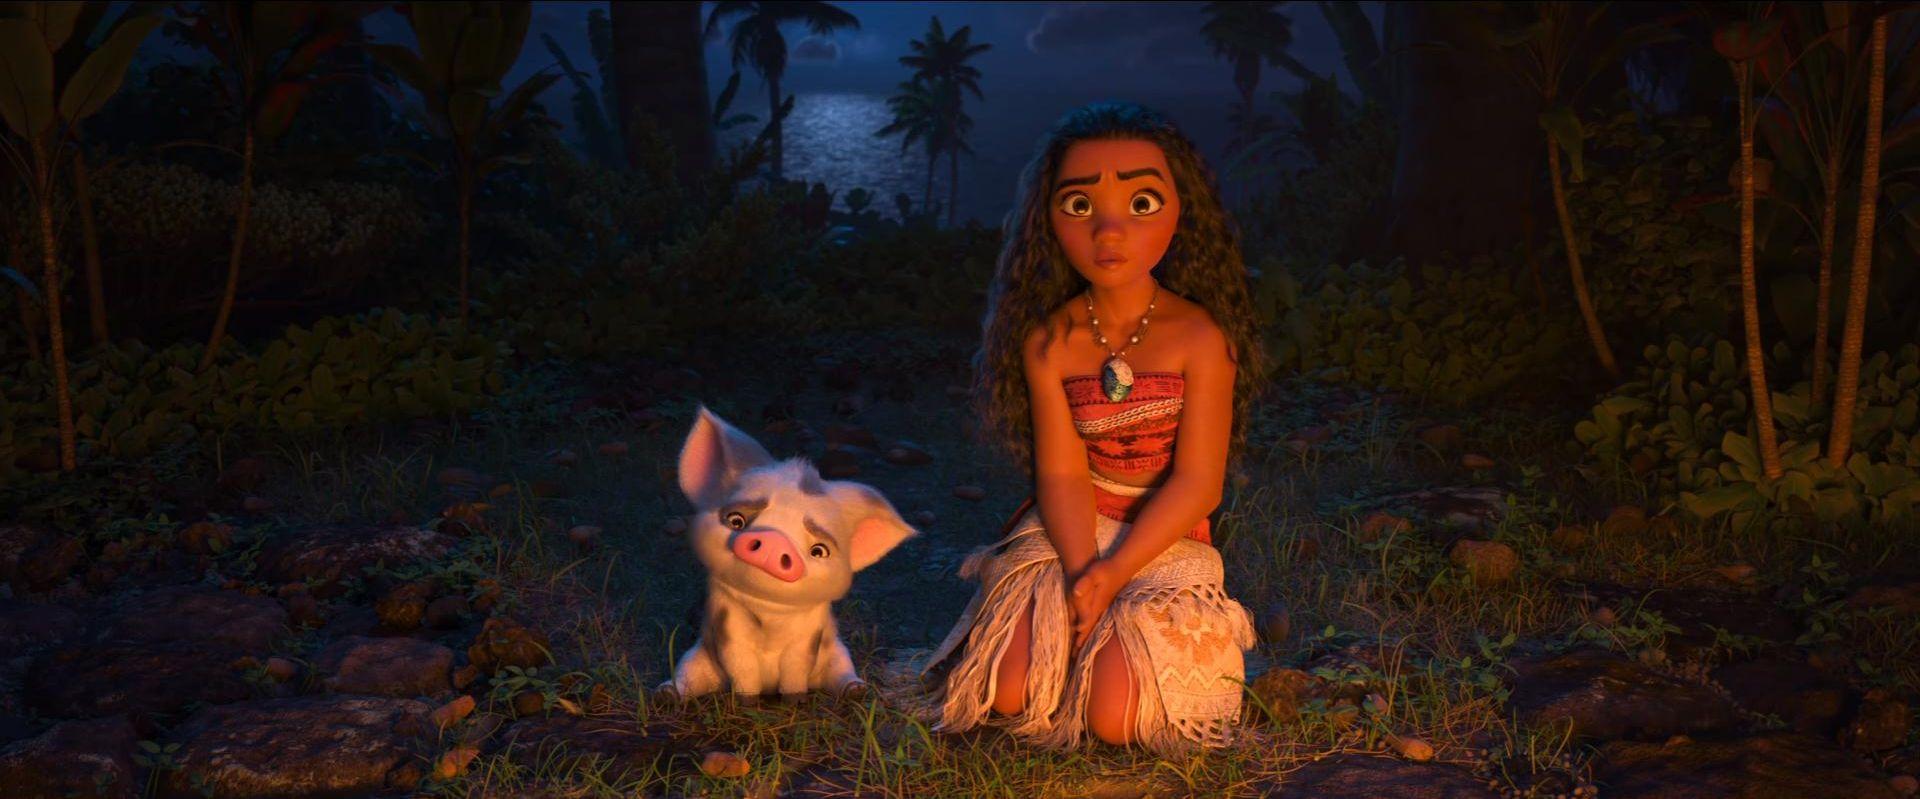 VIDEO: NOVI HIT DISNEYJA Pogledajte prvi trailer za 'Moanu'